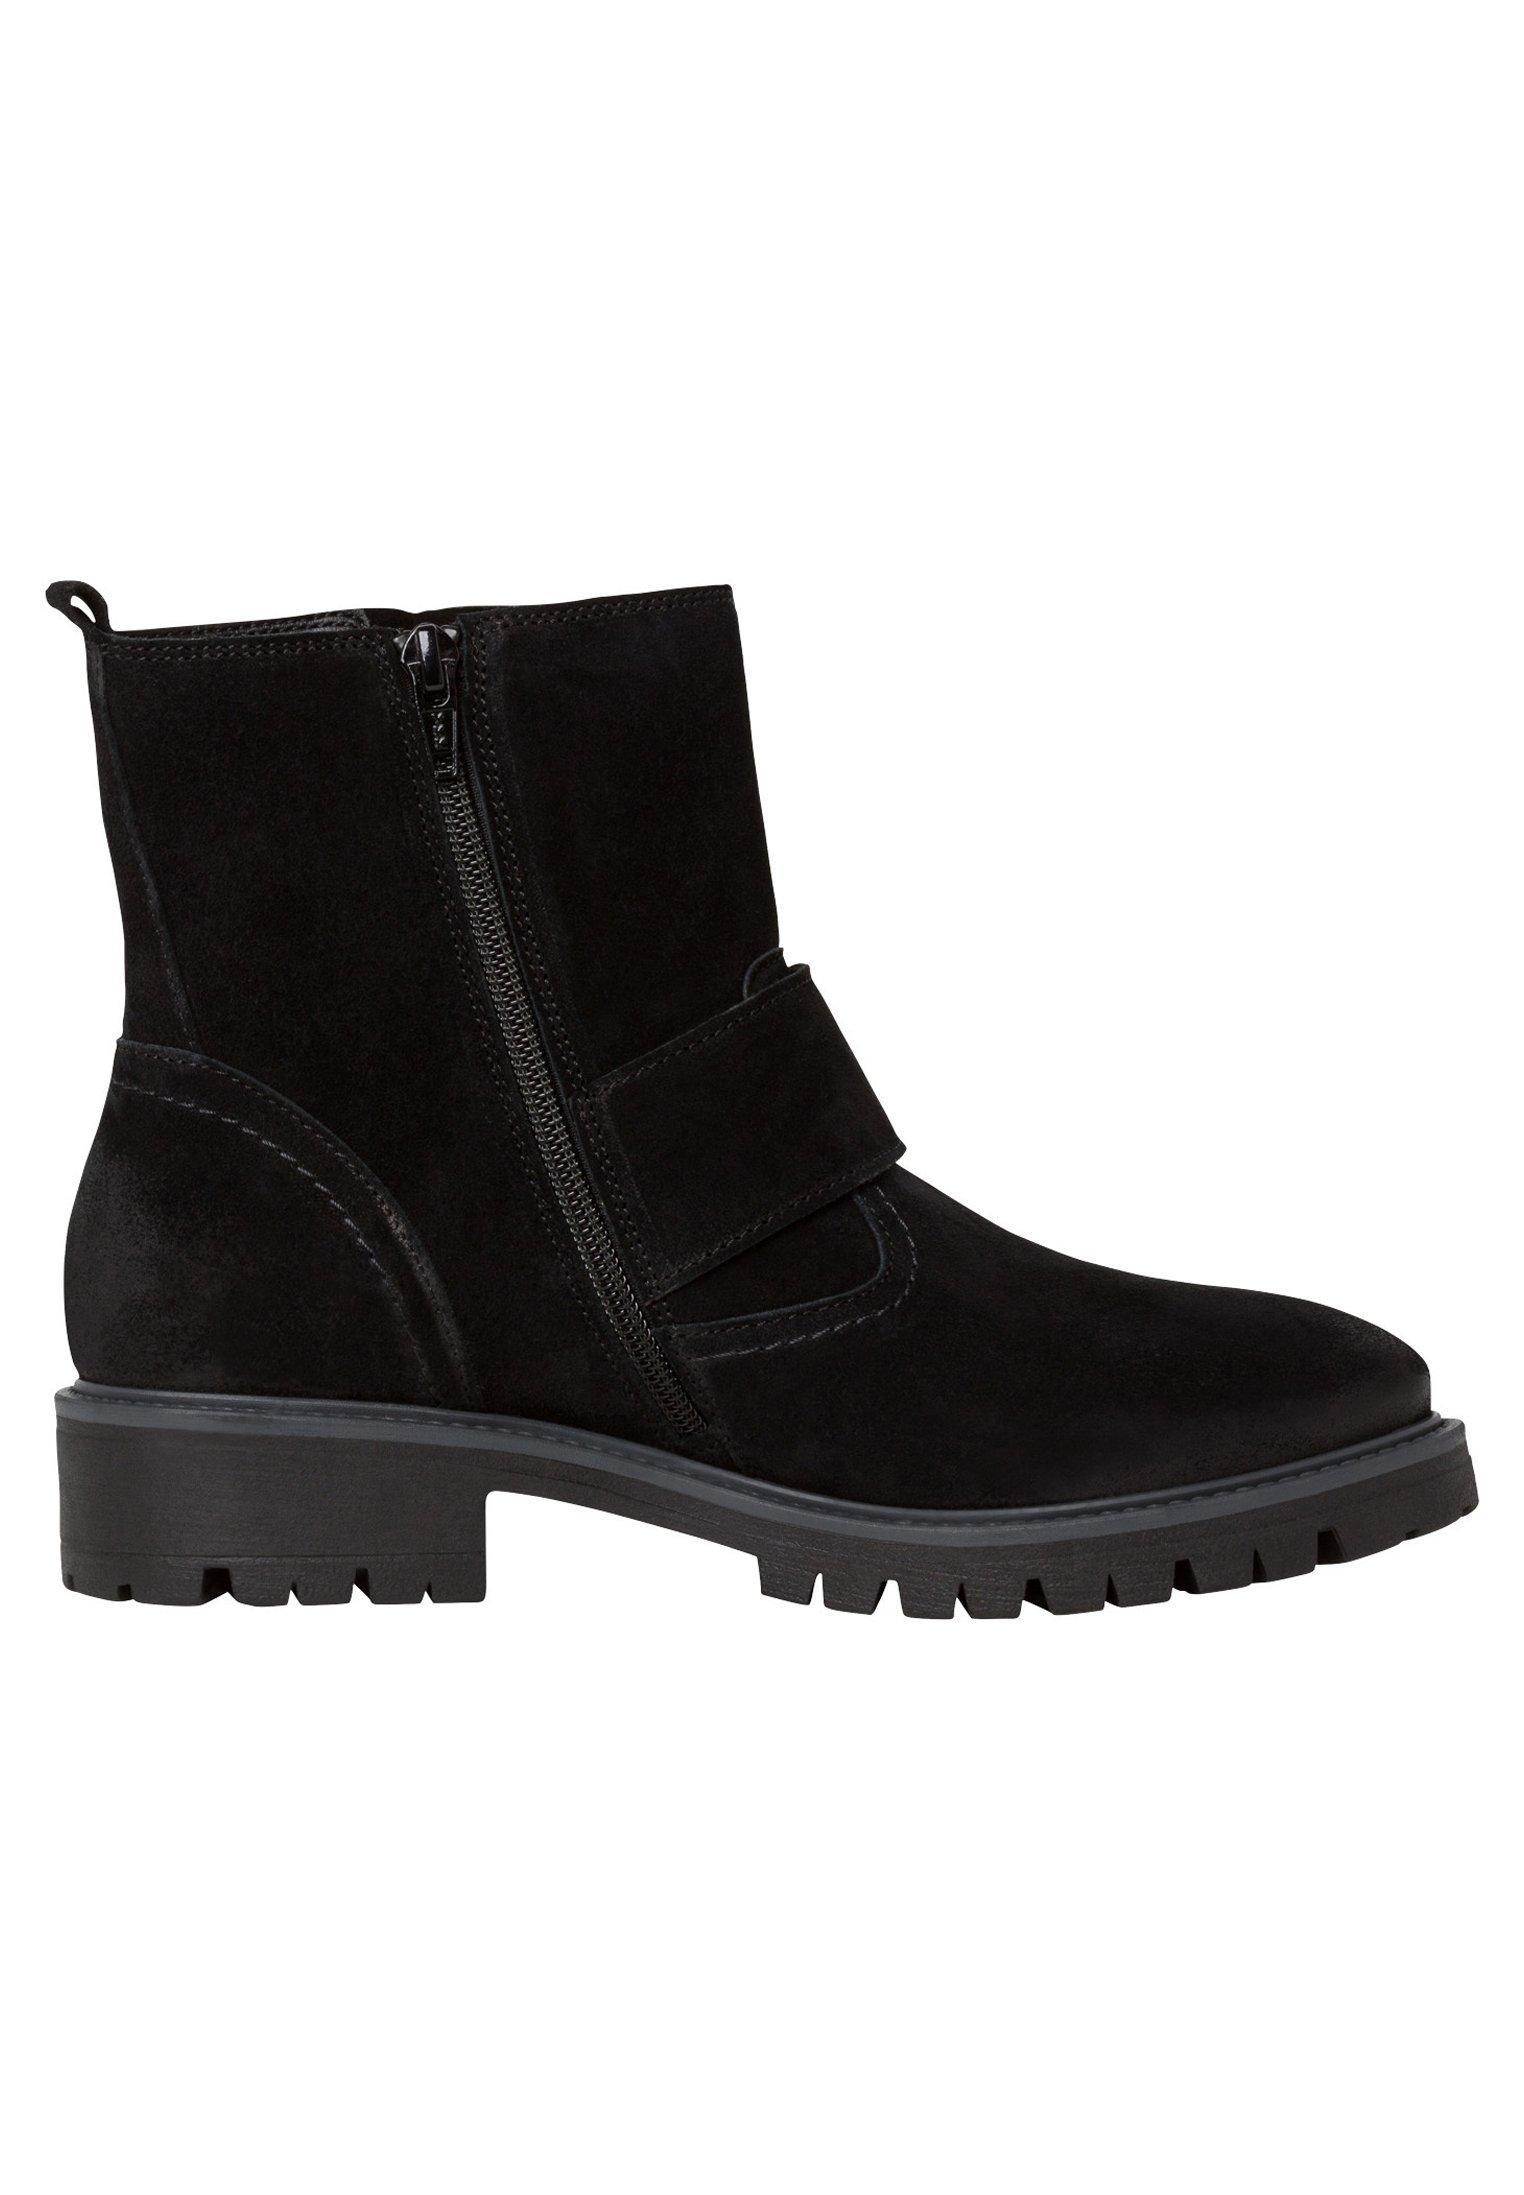 Tamaris Ankle Boot black uni/schwarz